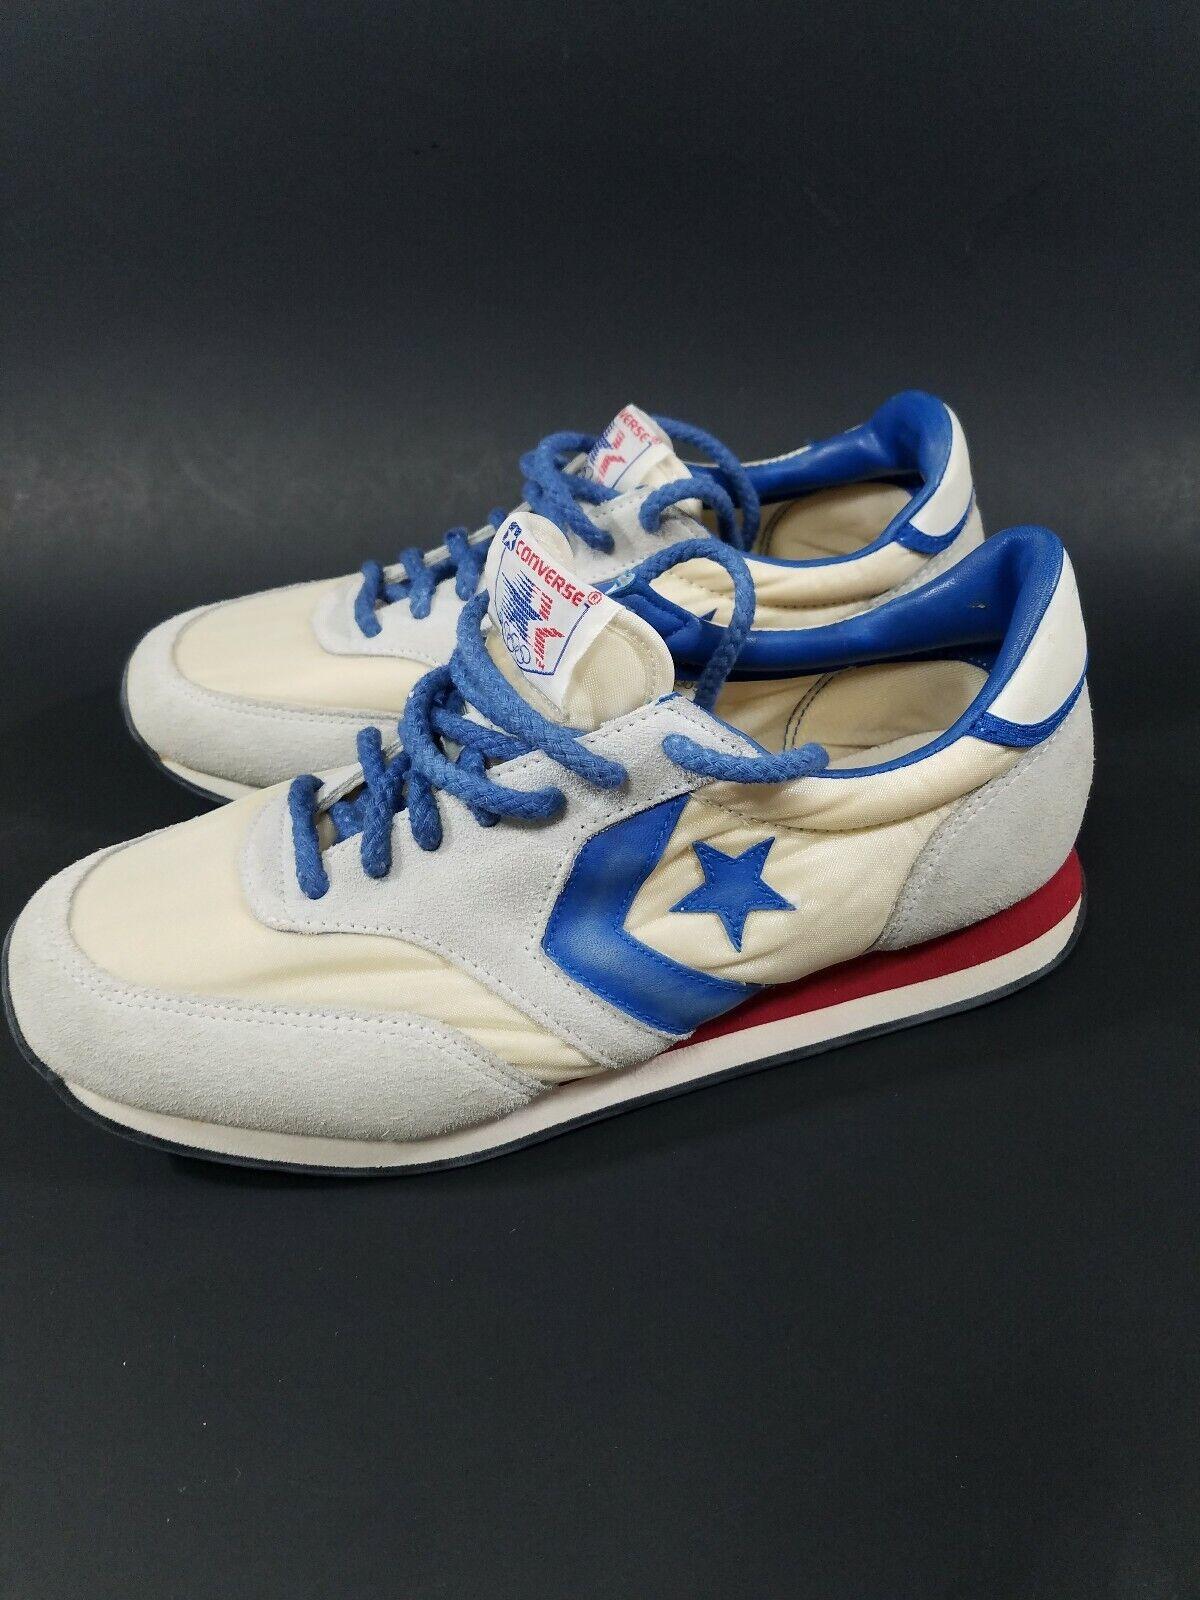 NICE VINTAGE 1980 OLYMPICS CONVERSE LOS ANGELES OLYMPICS WOMANS Dimensione 7 scarpe